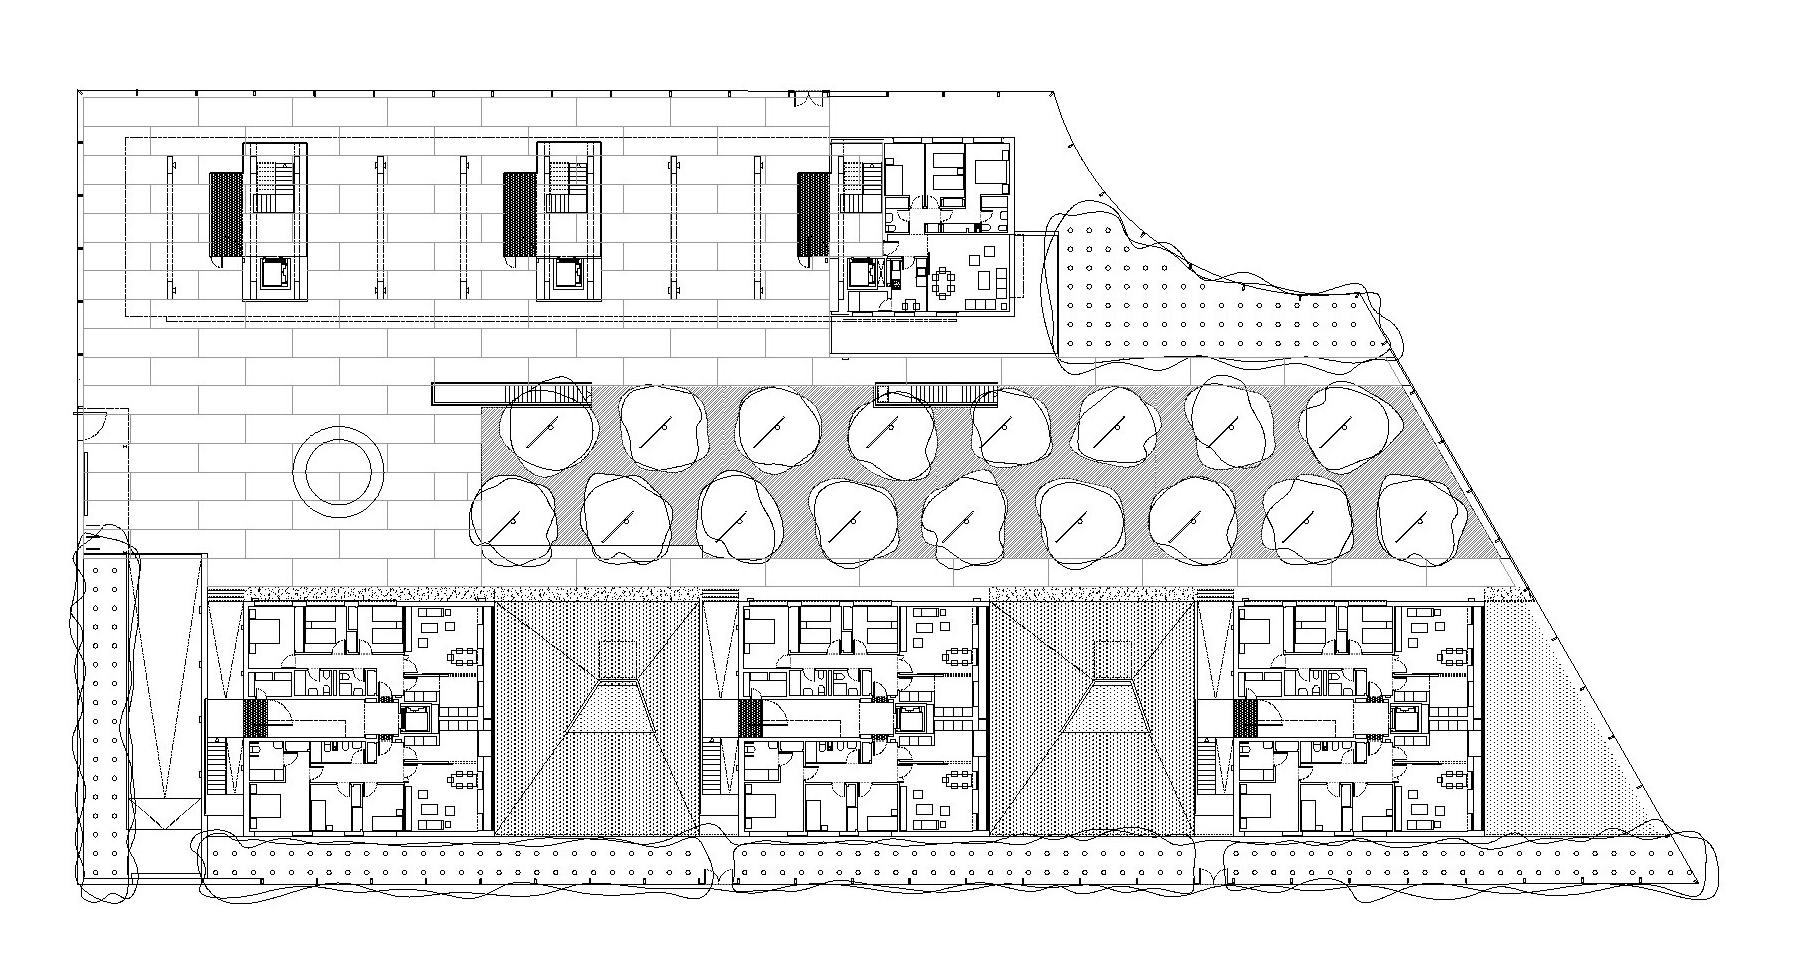 Galeria de conjunto habitacional em albacete burgos garrido arquitectos 24 - Arquitectos albacete ...